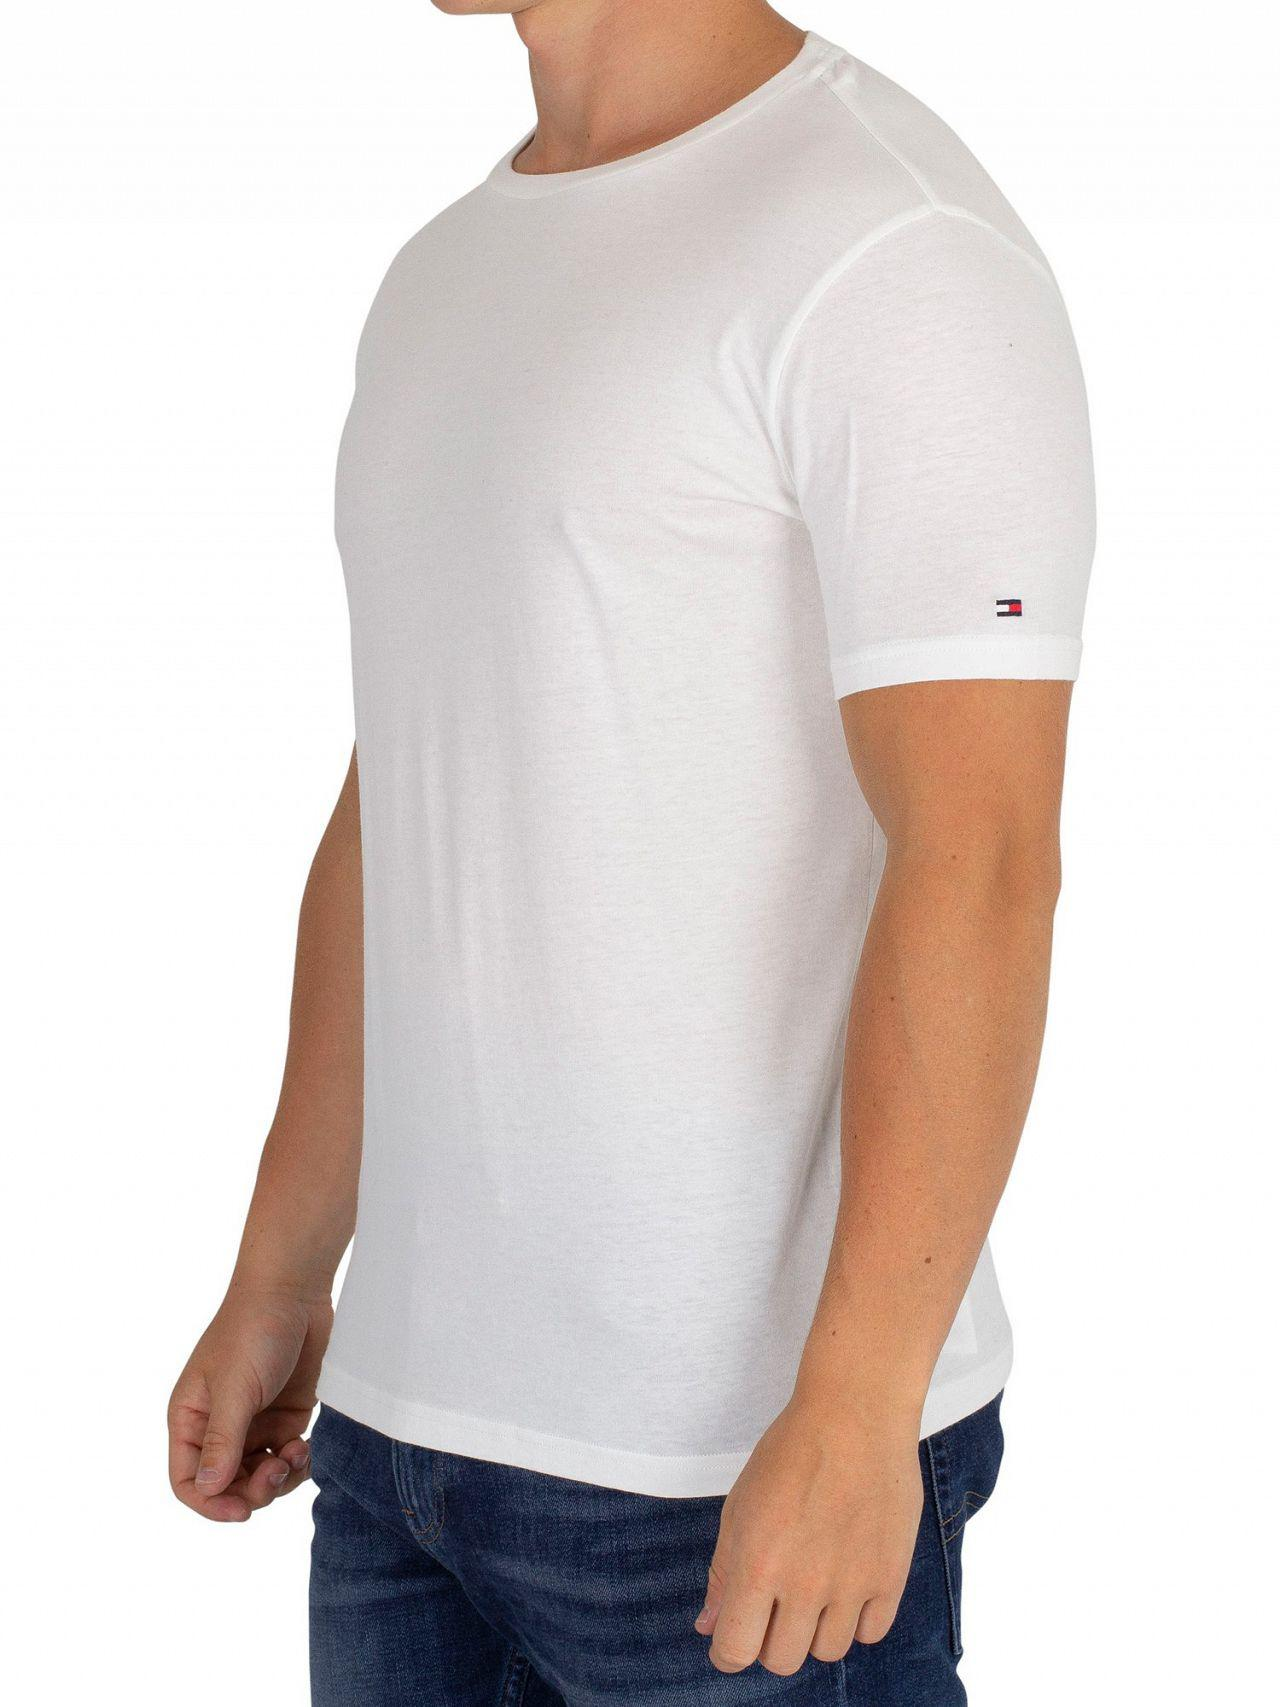 293f1e39029b Tommy Hilfiger Men s 2 Pack Cotton T-shirts